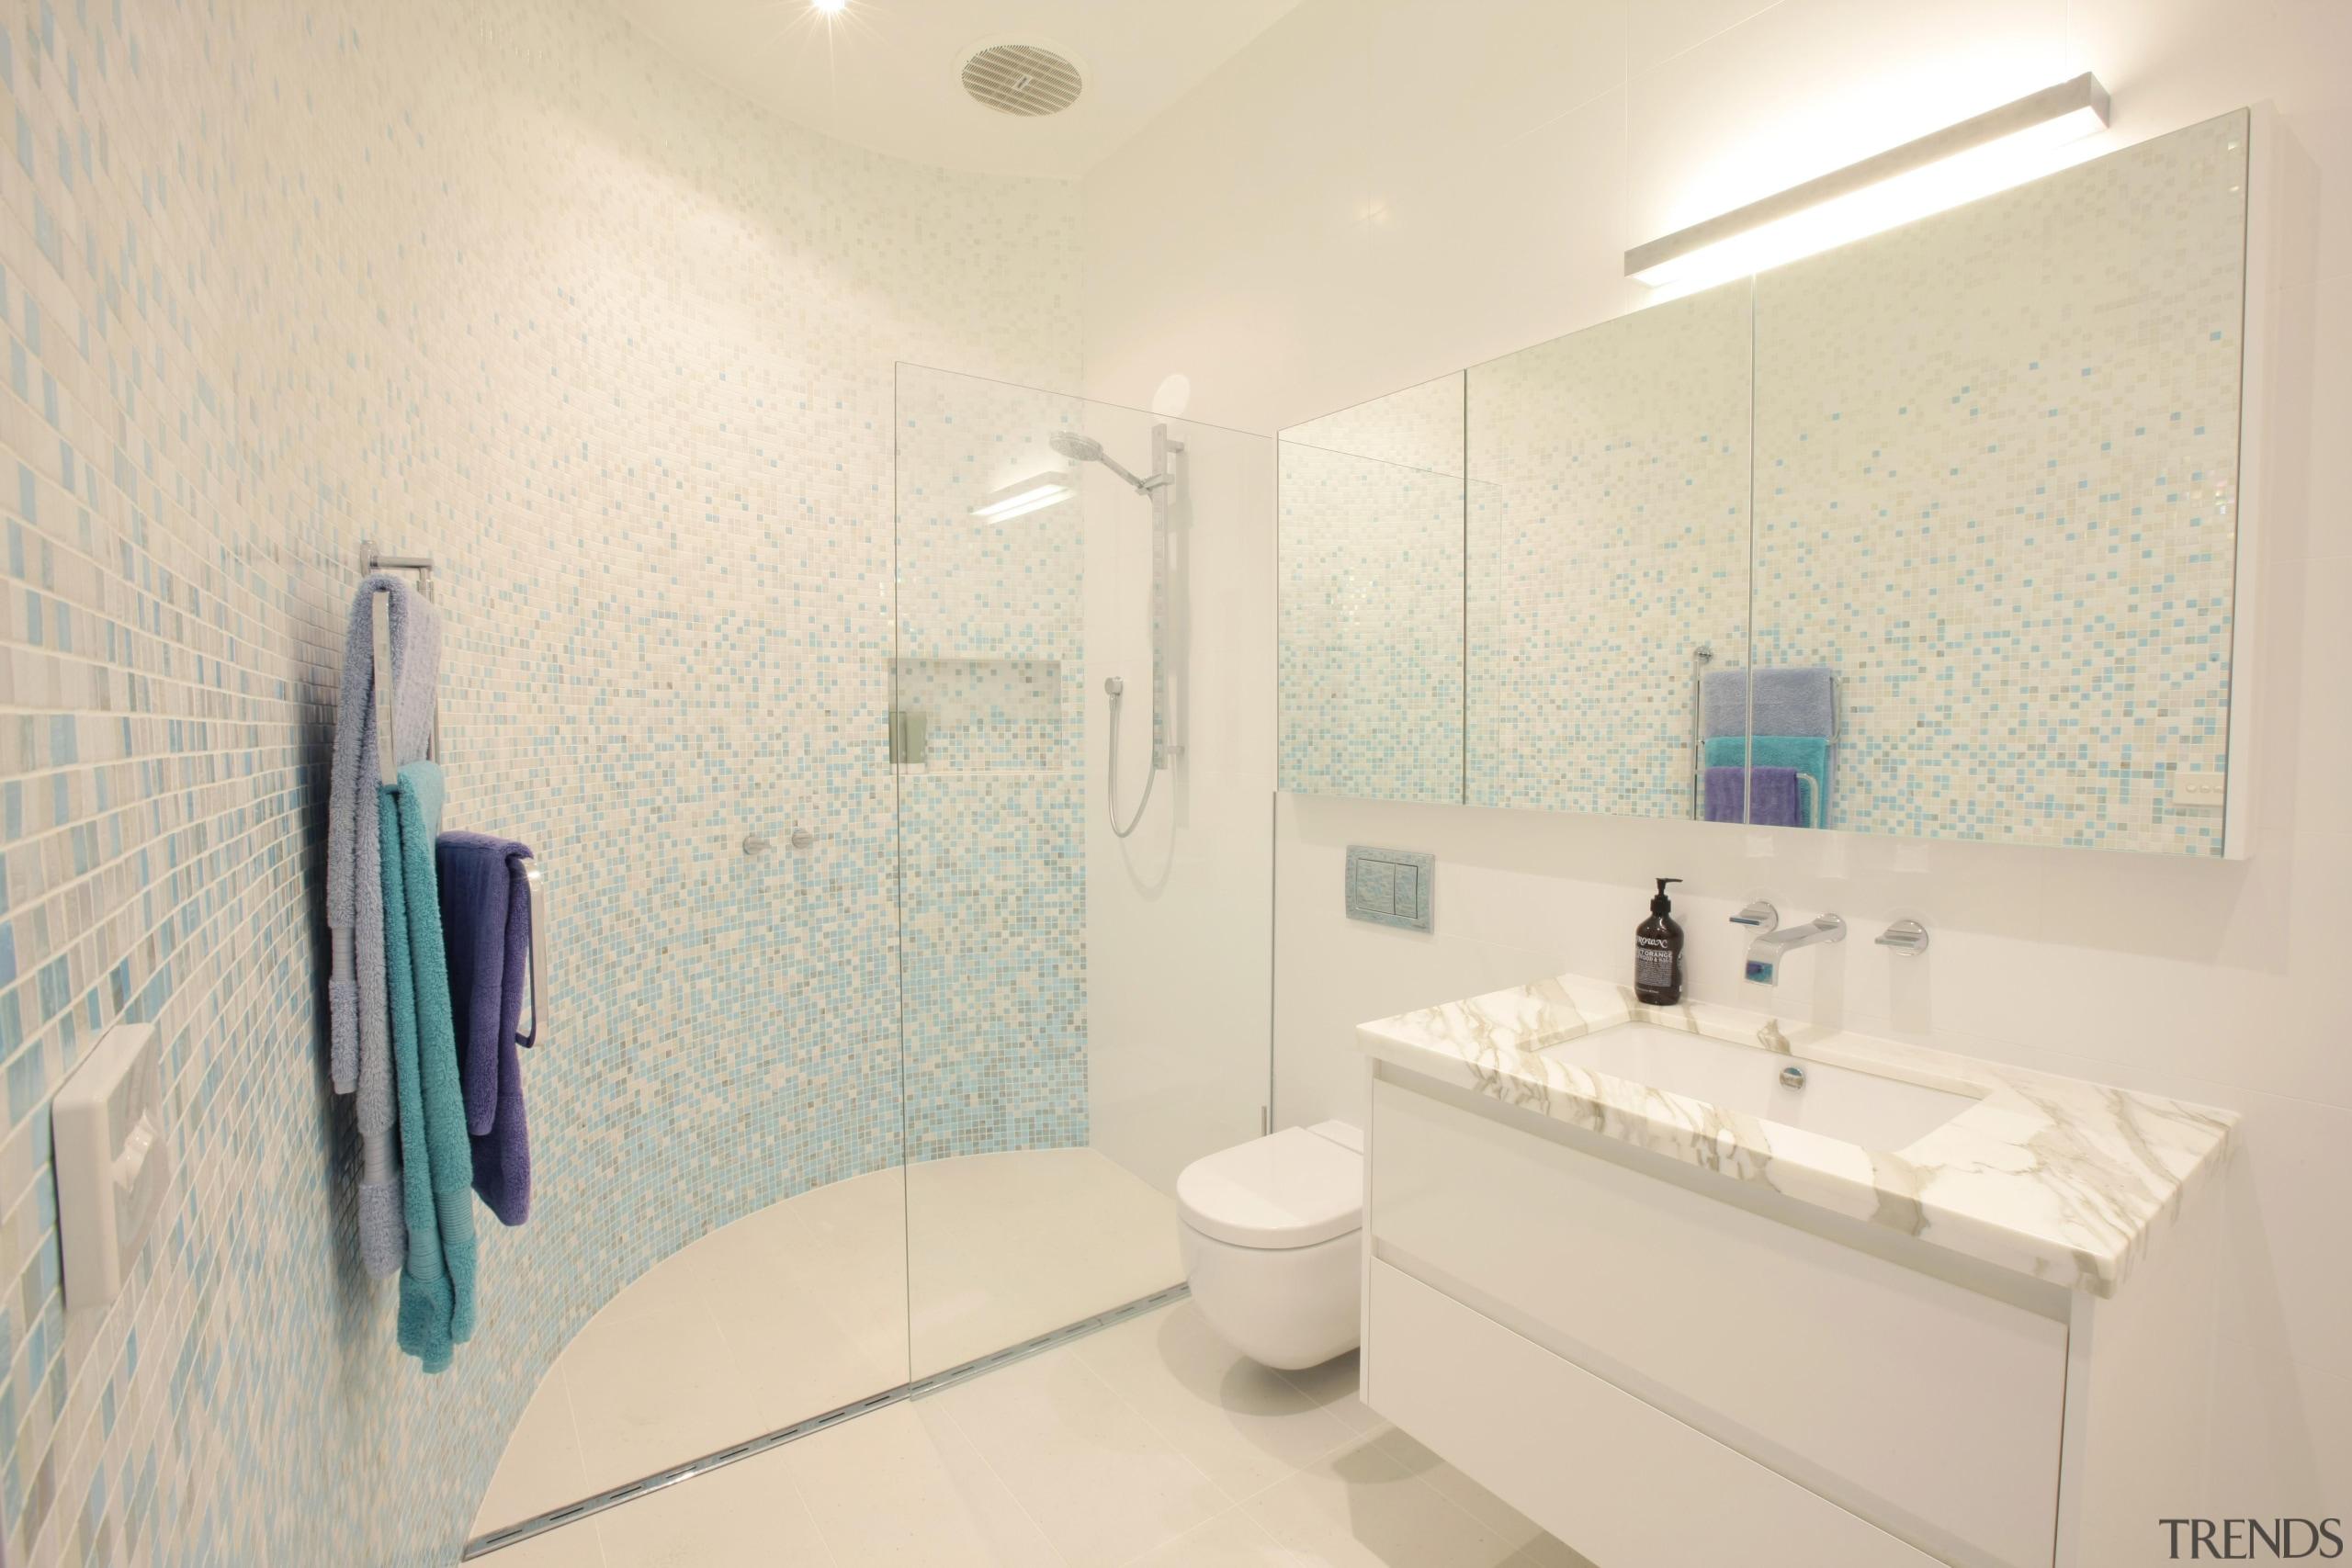 vicbathsmarterbathroomskitchens1.jpg - vicbathsmarterbathroomskitchens1.jpg - bathroom | daylighting | bathroom, daylighting, floor, home, interior design, property, real estate, room, sink, tile, wall, white